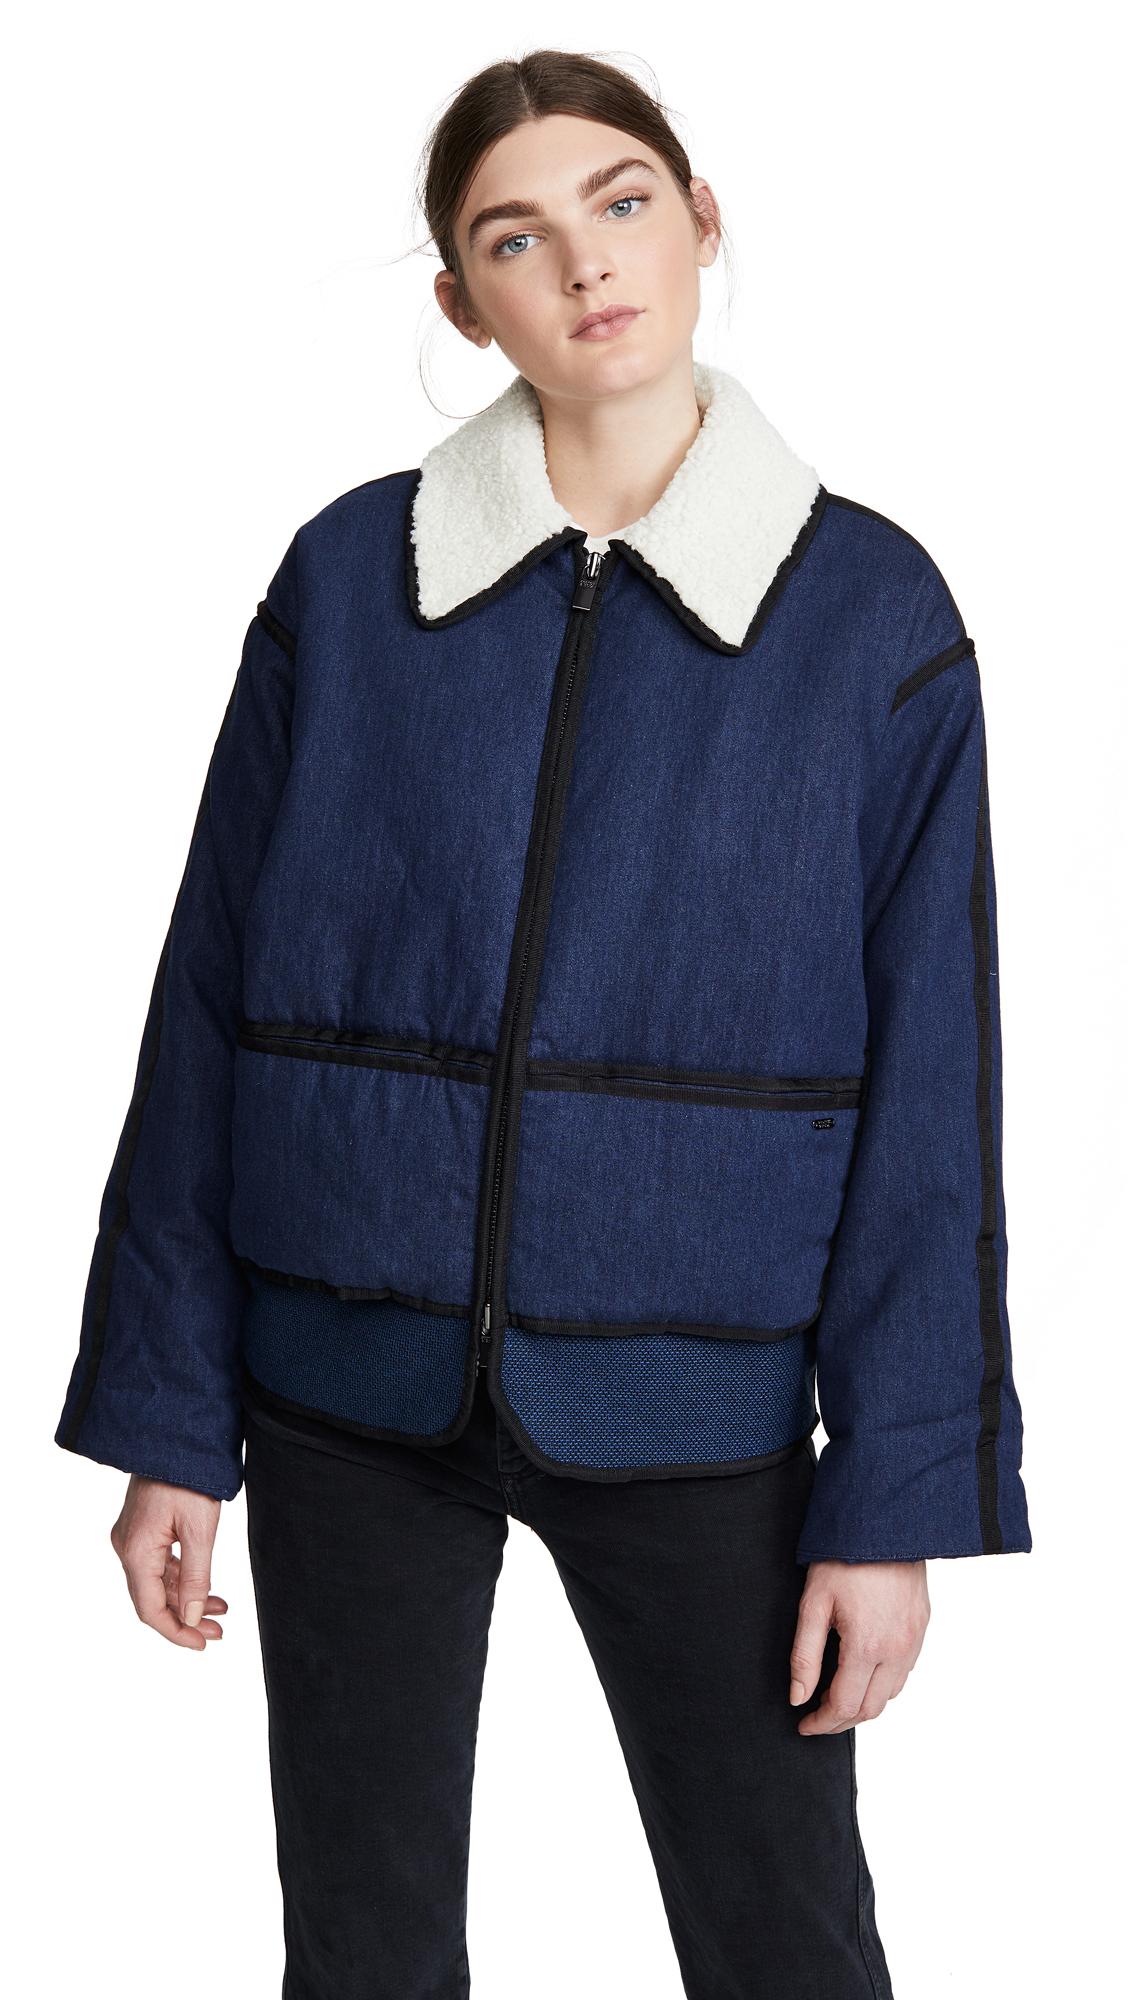 Buy Scotch & Soda/Maison Scotch Padded Denim Bomber Jacket online beautiful Scotch & Soda/Maison Scotch Jackets, Coats, Down Jackets